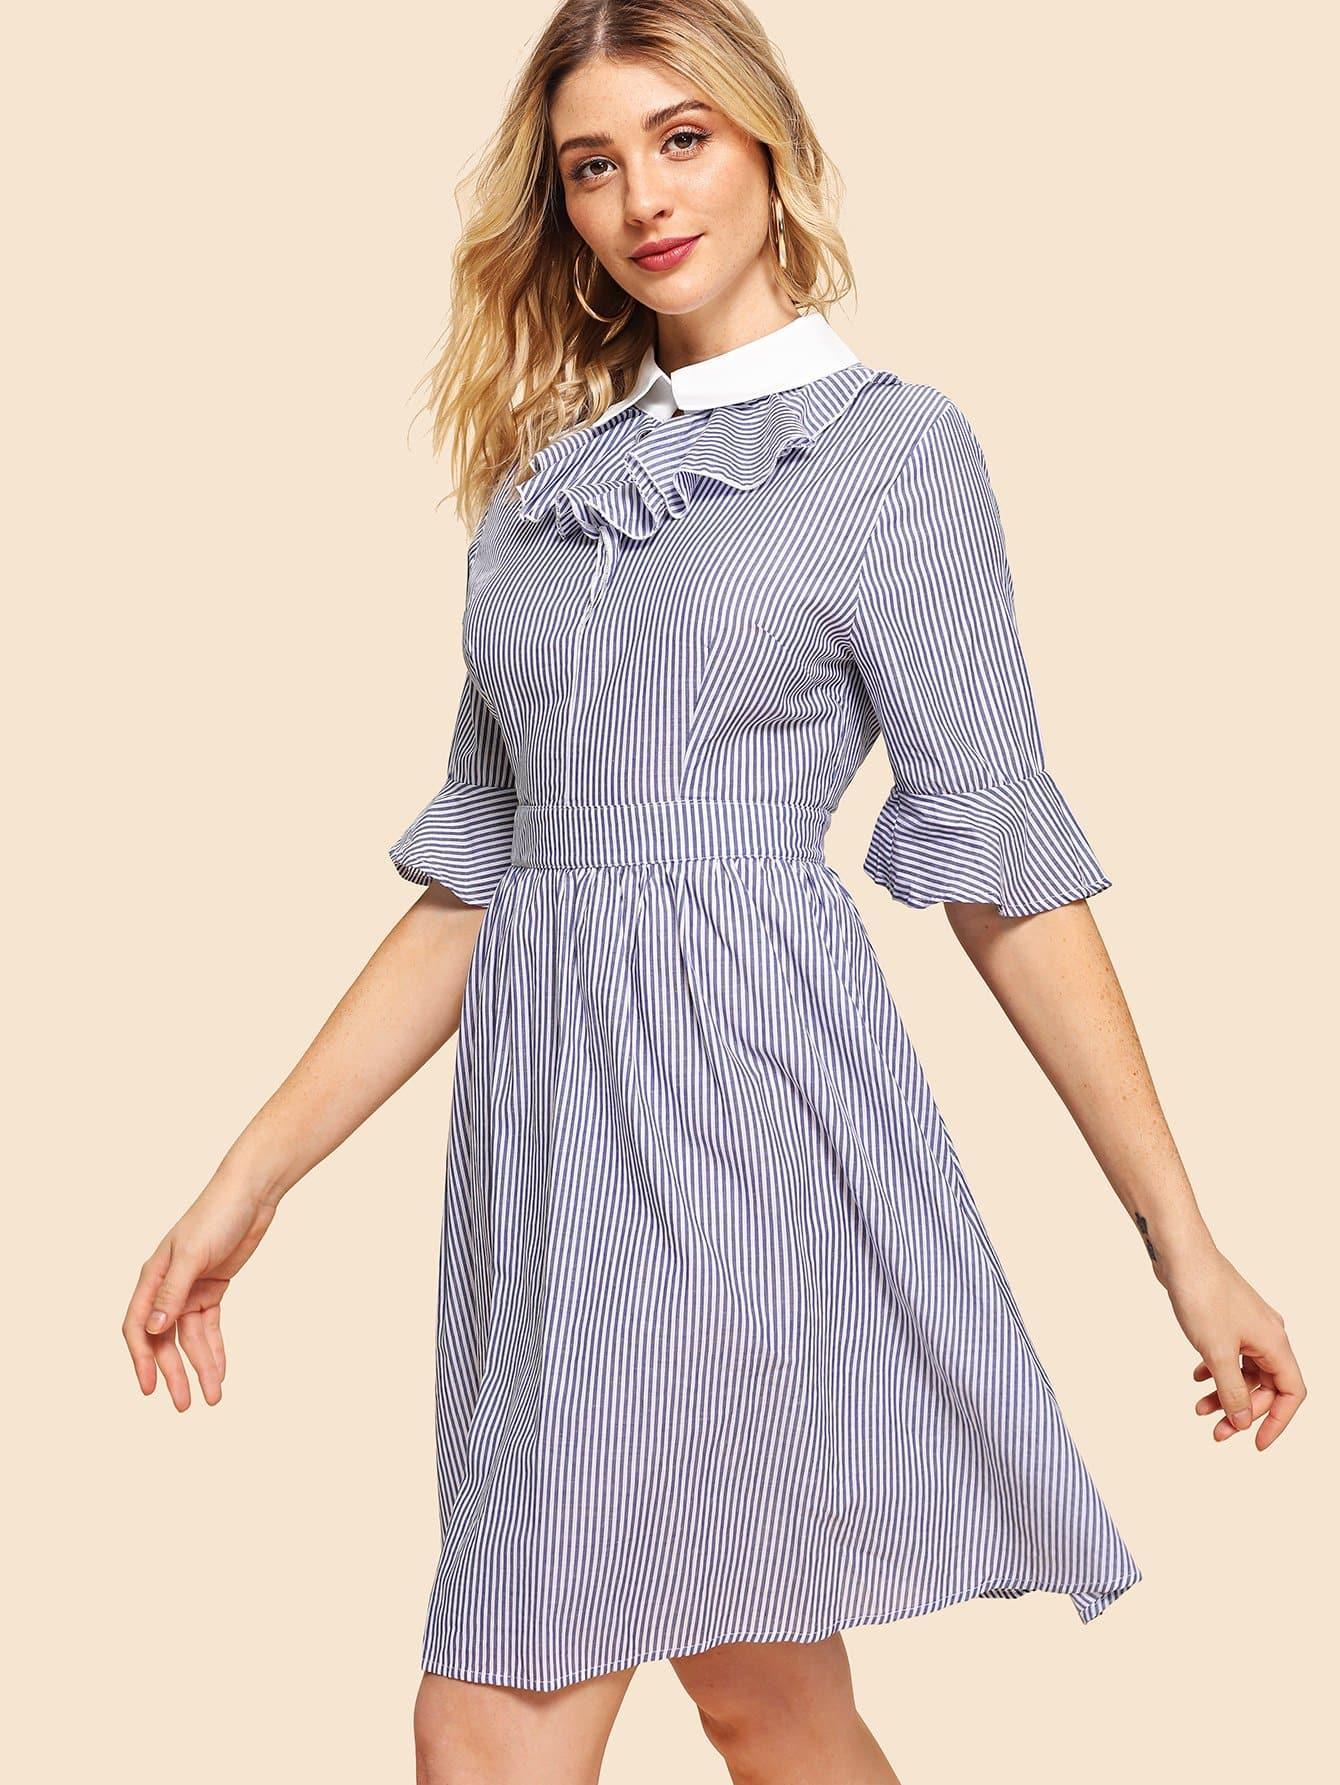 Contrast Collar Pinstripe Flare Dress contrast collar lace applique pleated pinstripe dress